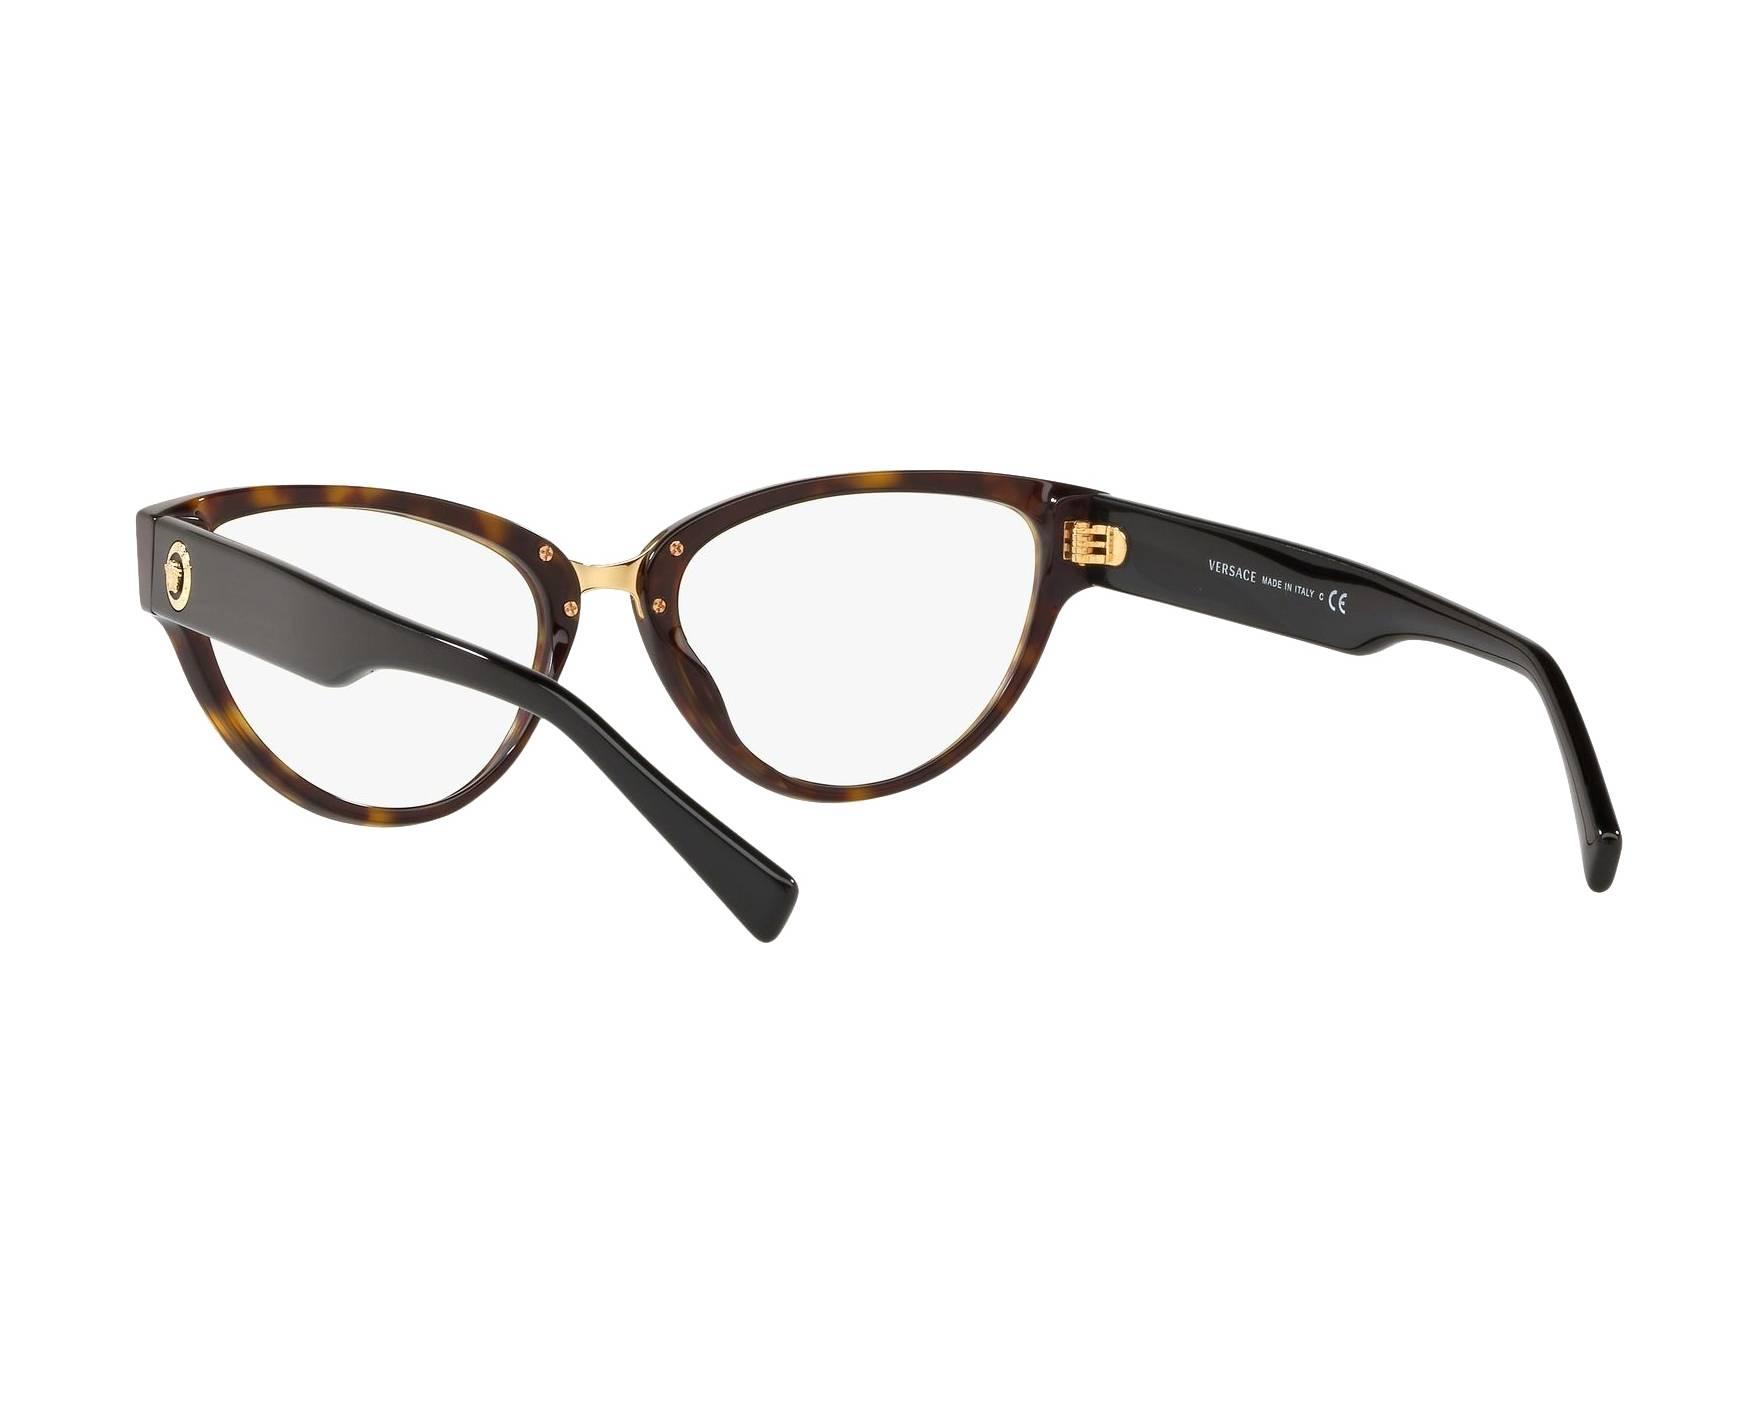 a55d83dcf87 eyeglasses Versace VE-3267 108 53-17 Havana Black 360 degree view 6